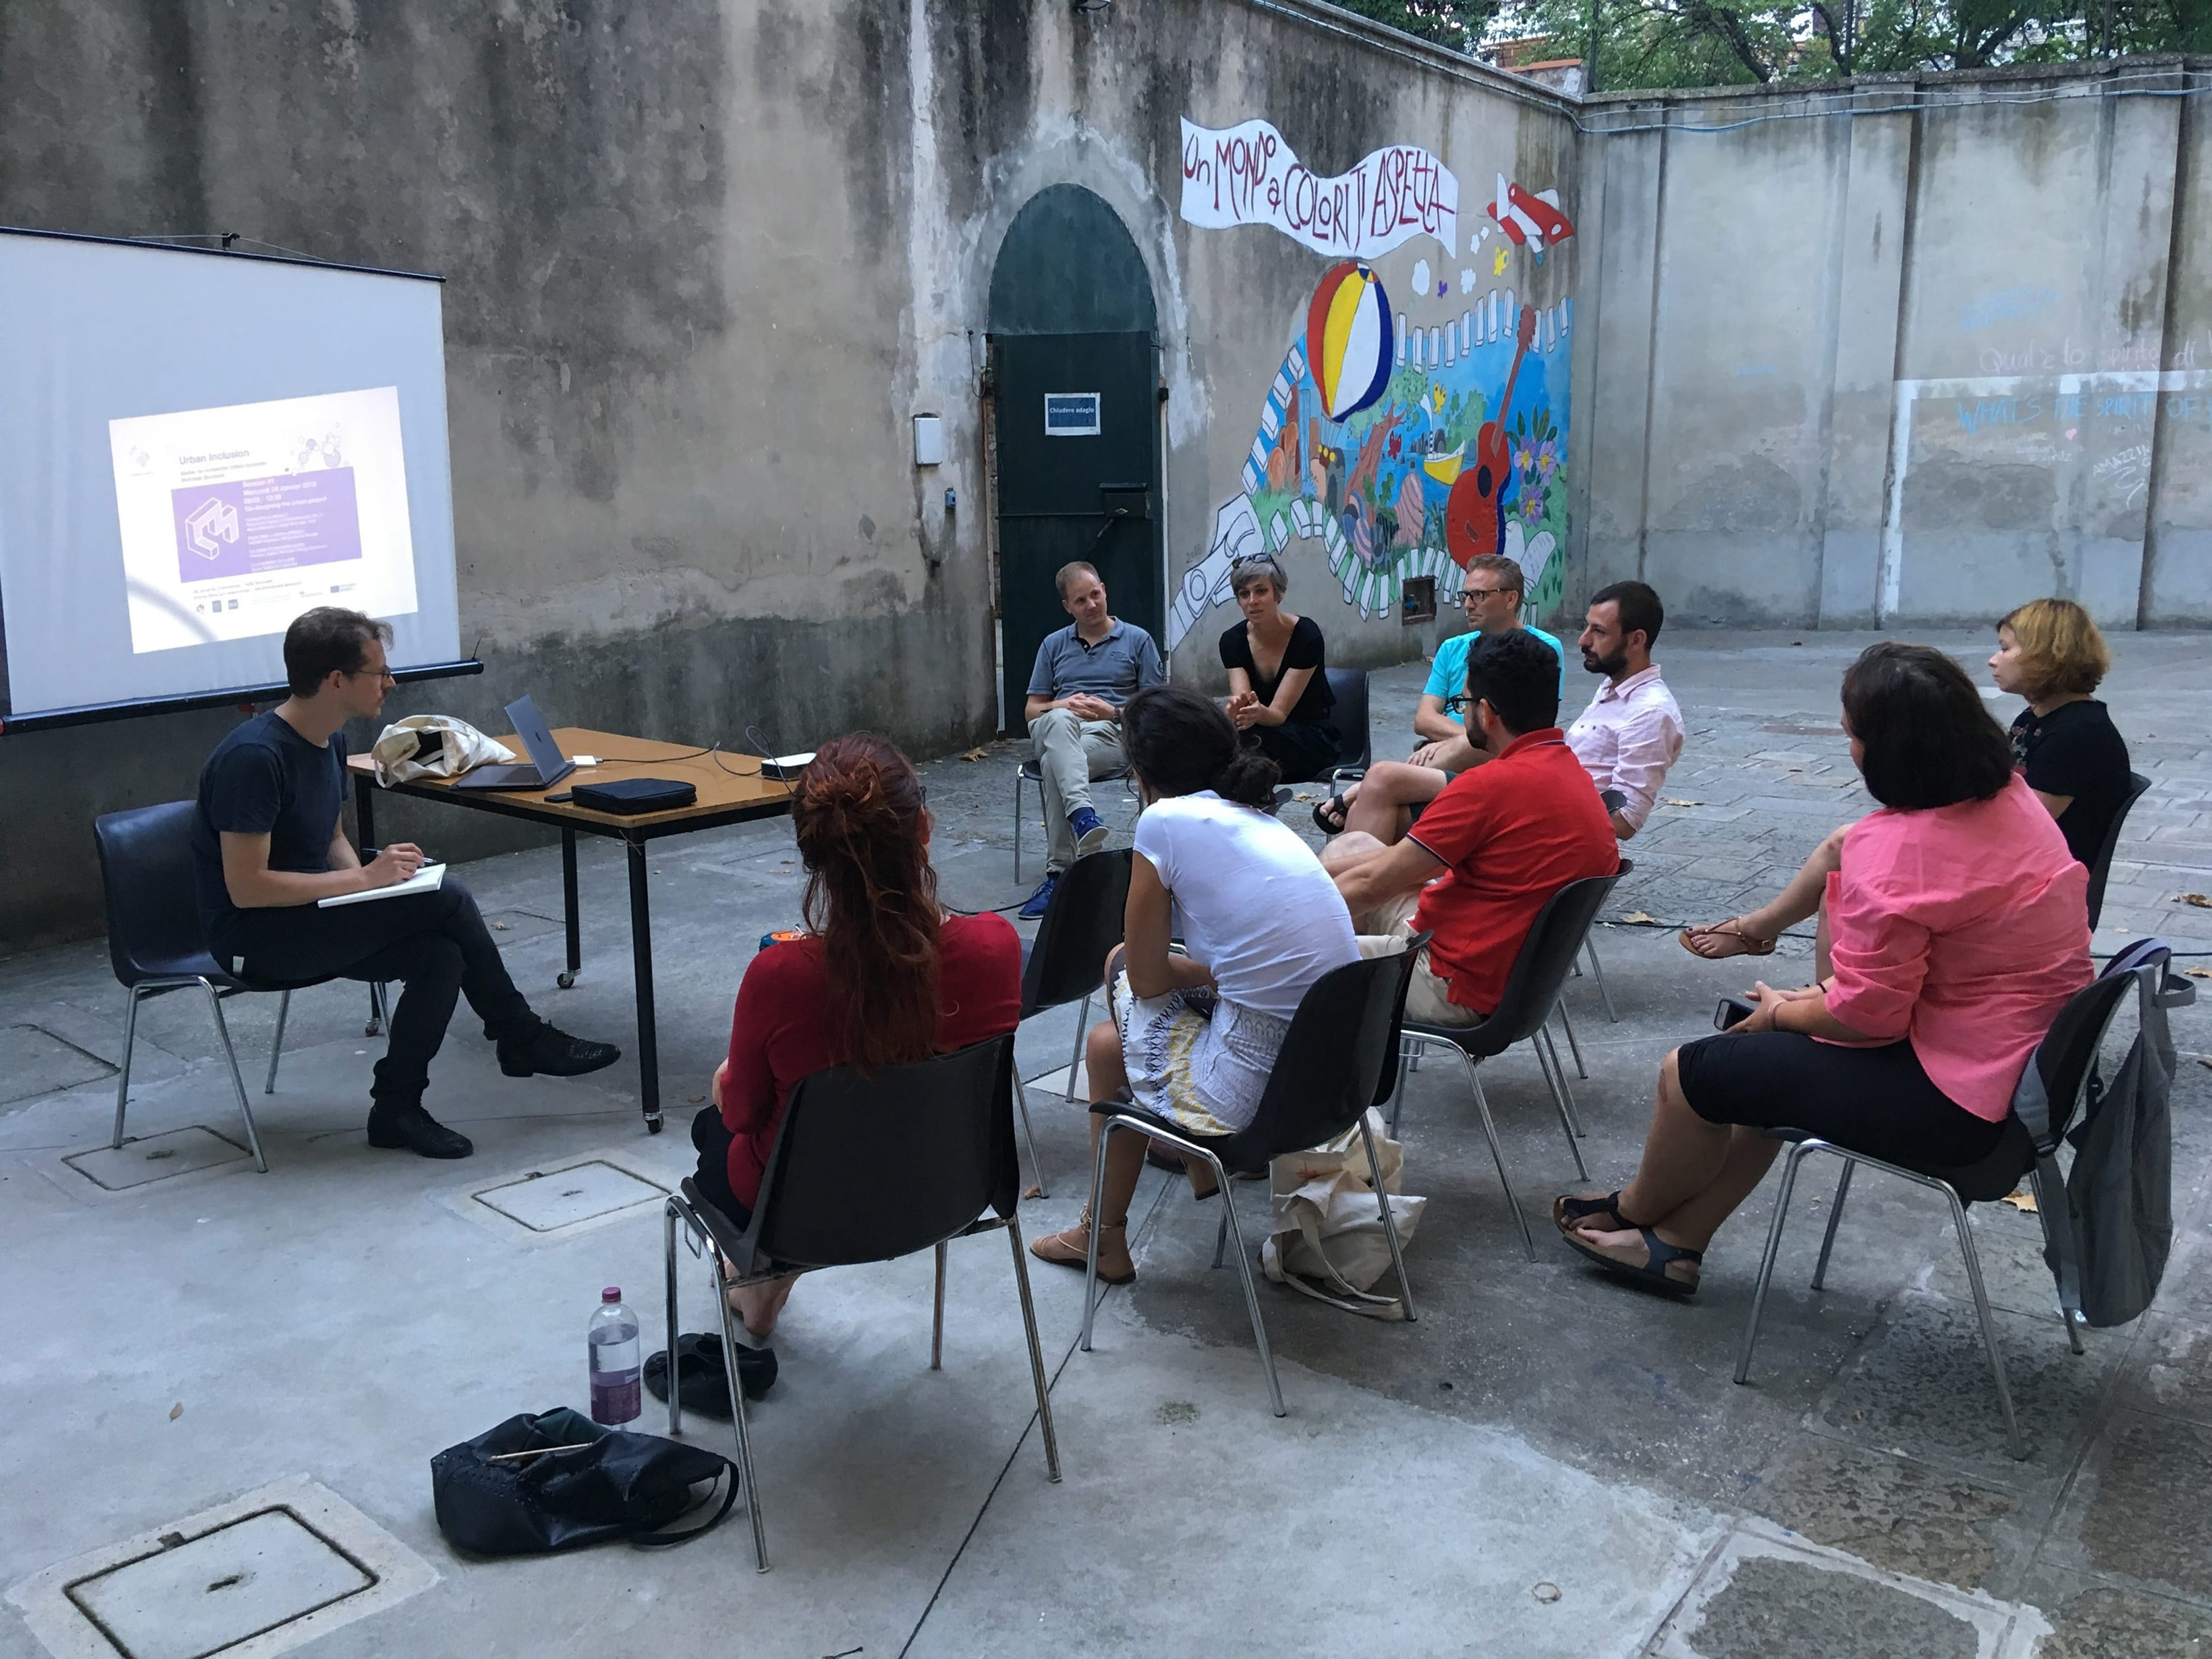 UEL Venice Marcos presentation 5